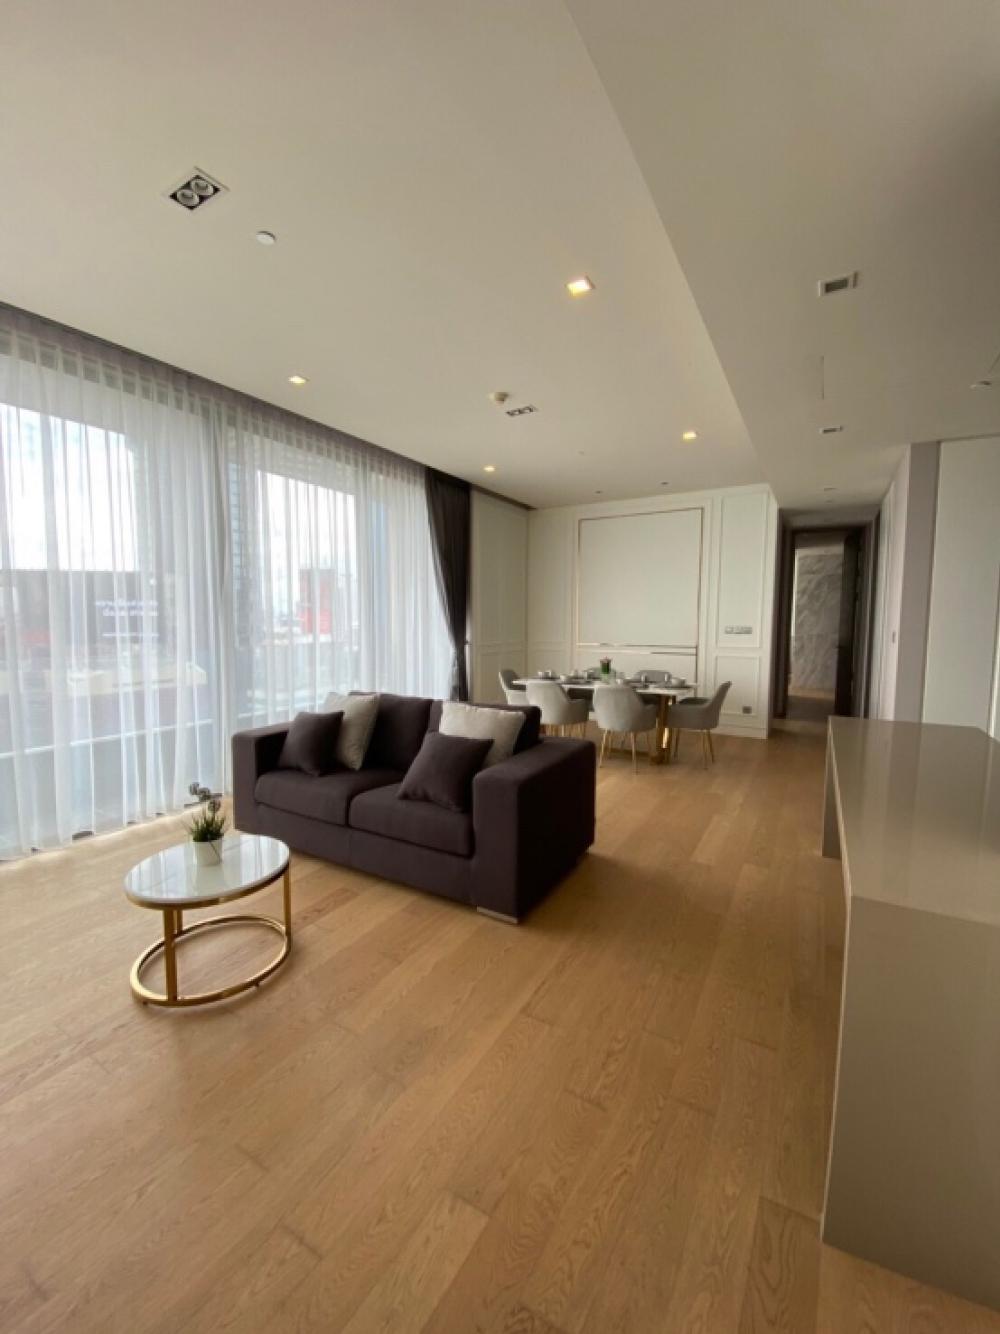 For RentCondoSilom, Saladaeng, Bangrak : For rent!!!! Saladaeng One 2 Bed 114sq.m Lumpini View Best View ,Brand New, Best Deal Call 061-9796655